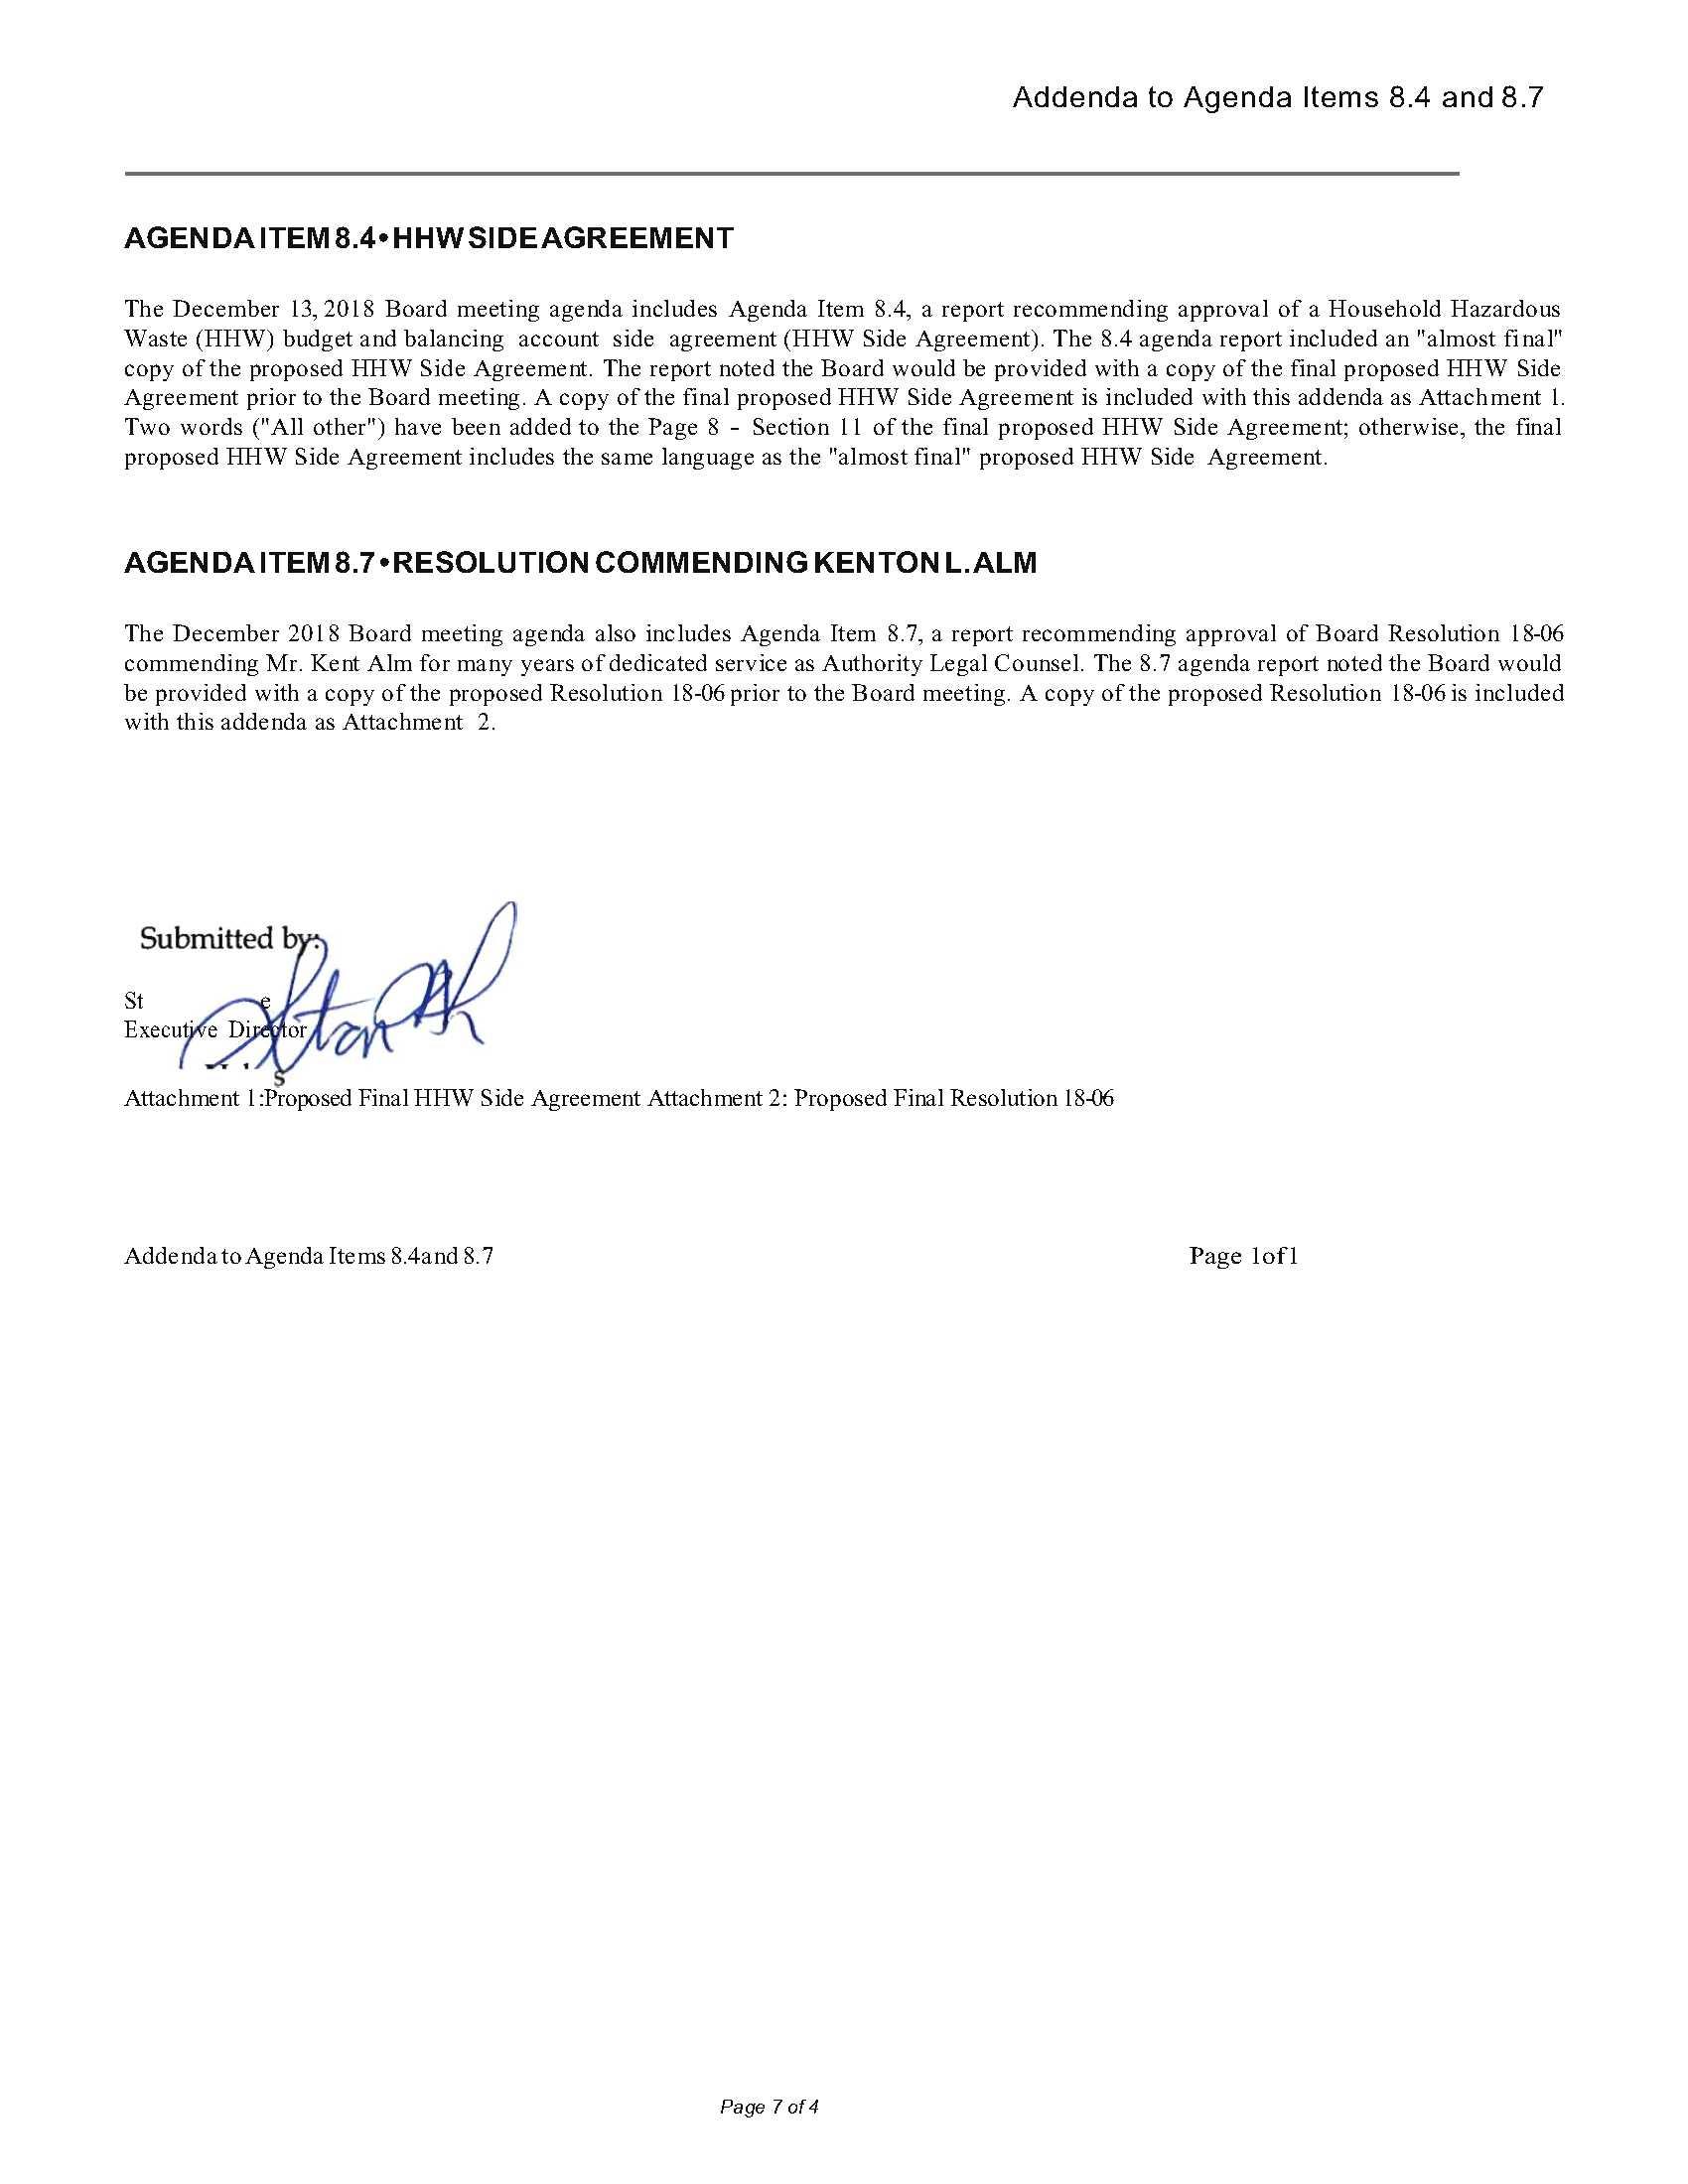 ESMAC Agenda 1.9.2019 (34 Pages)_22.jpg